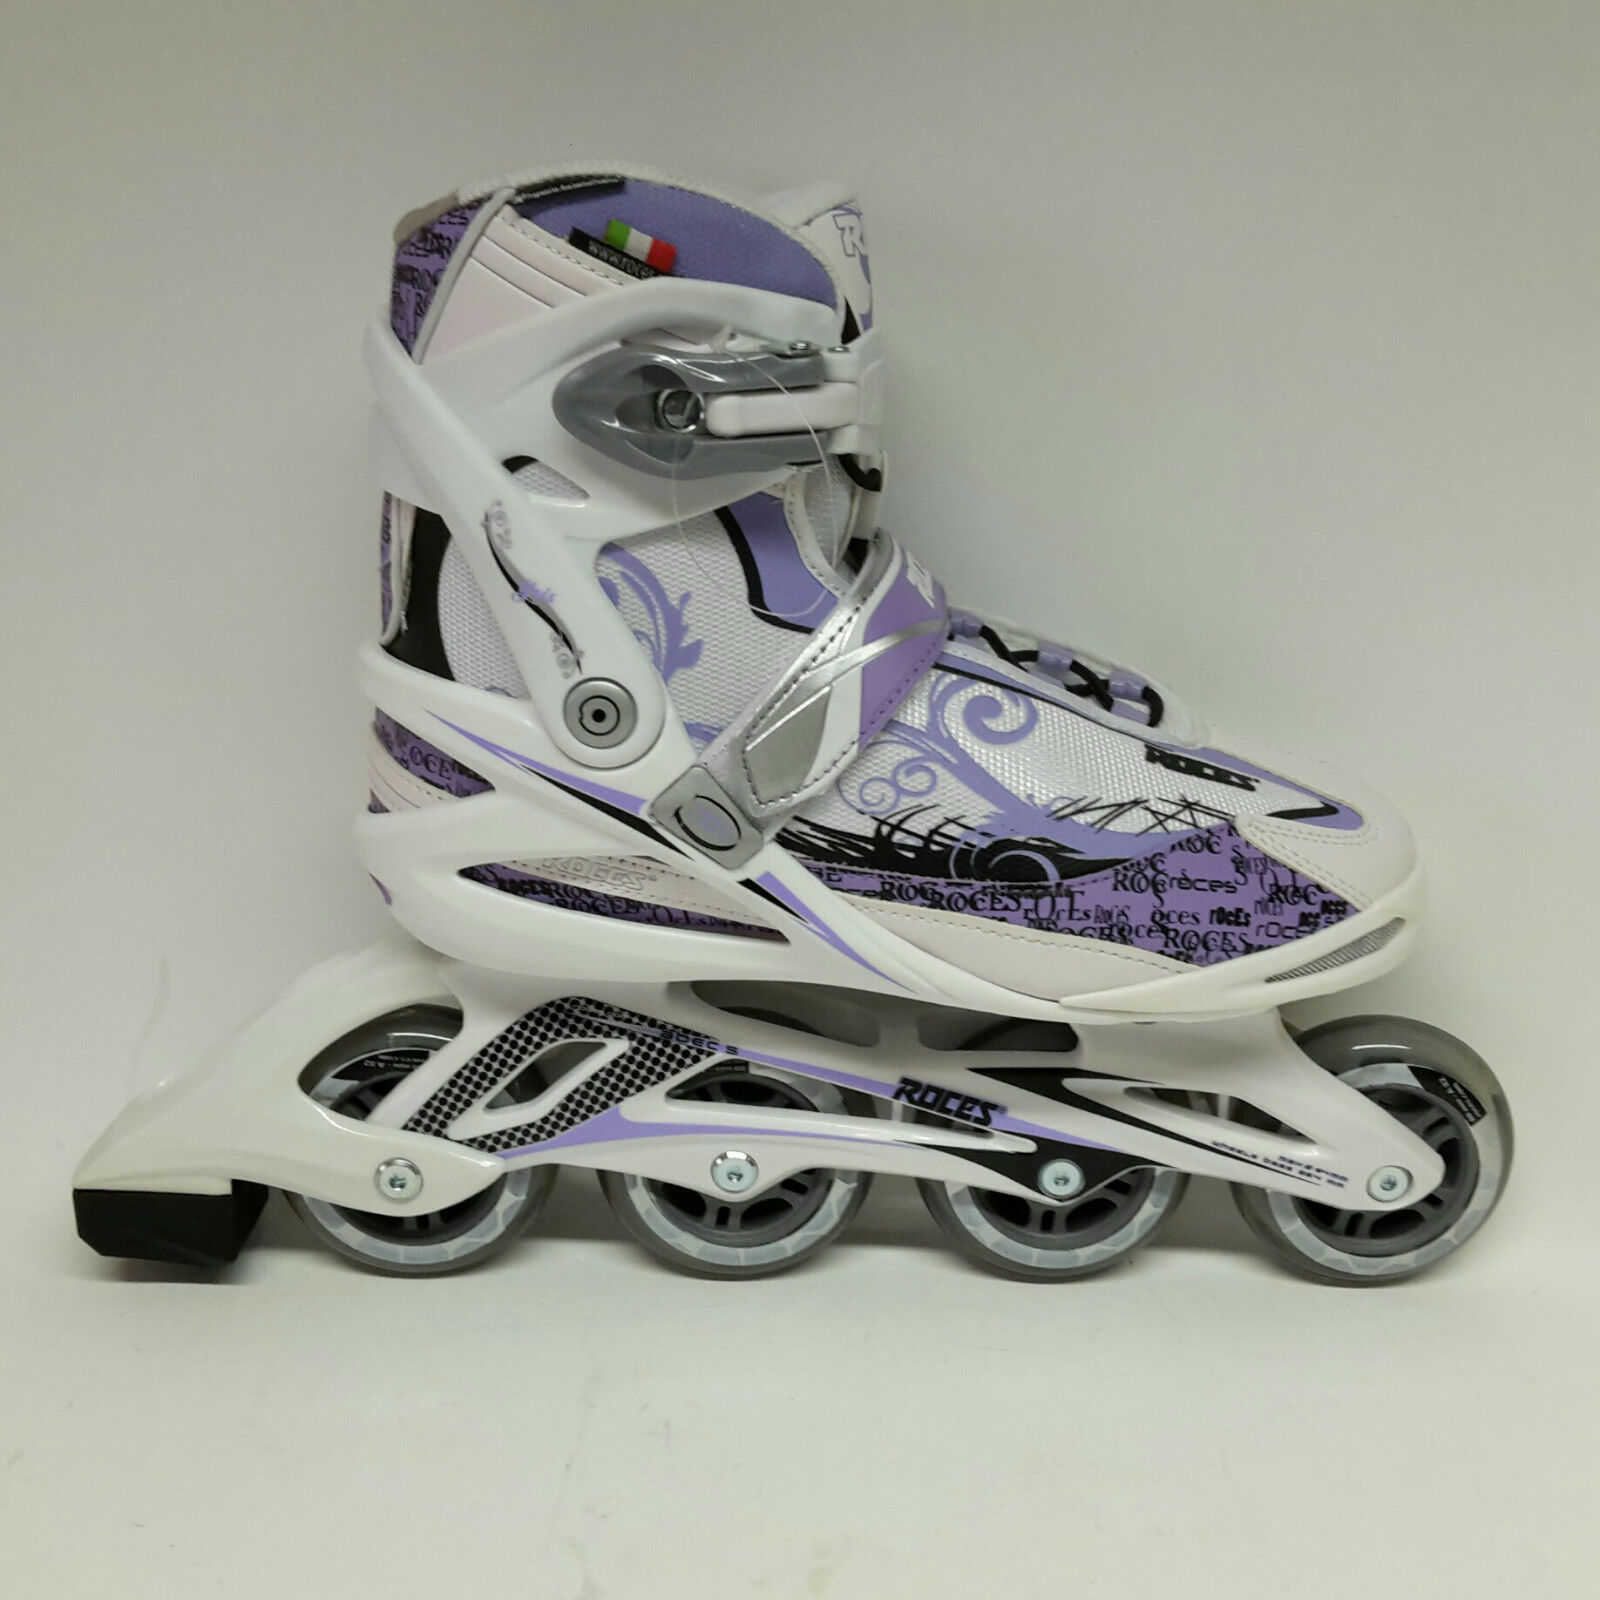 Roces Yris weiss lila Damen  Fitness Fitness Fitness Inline Skates  Inliner Gr. 41 Sale Abec 5 da2a4d